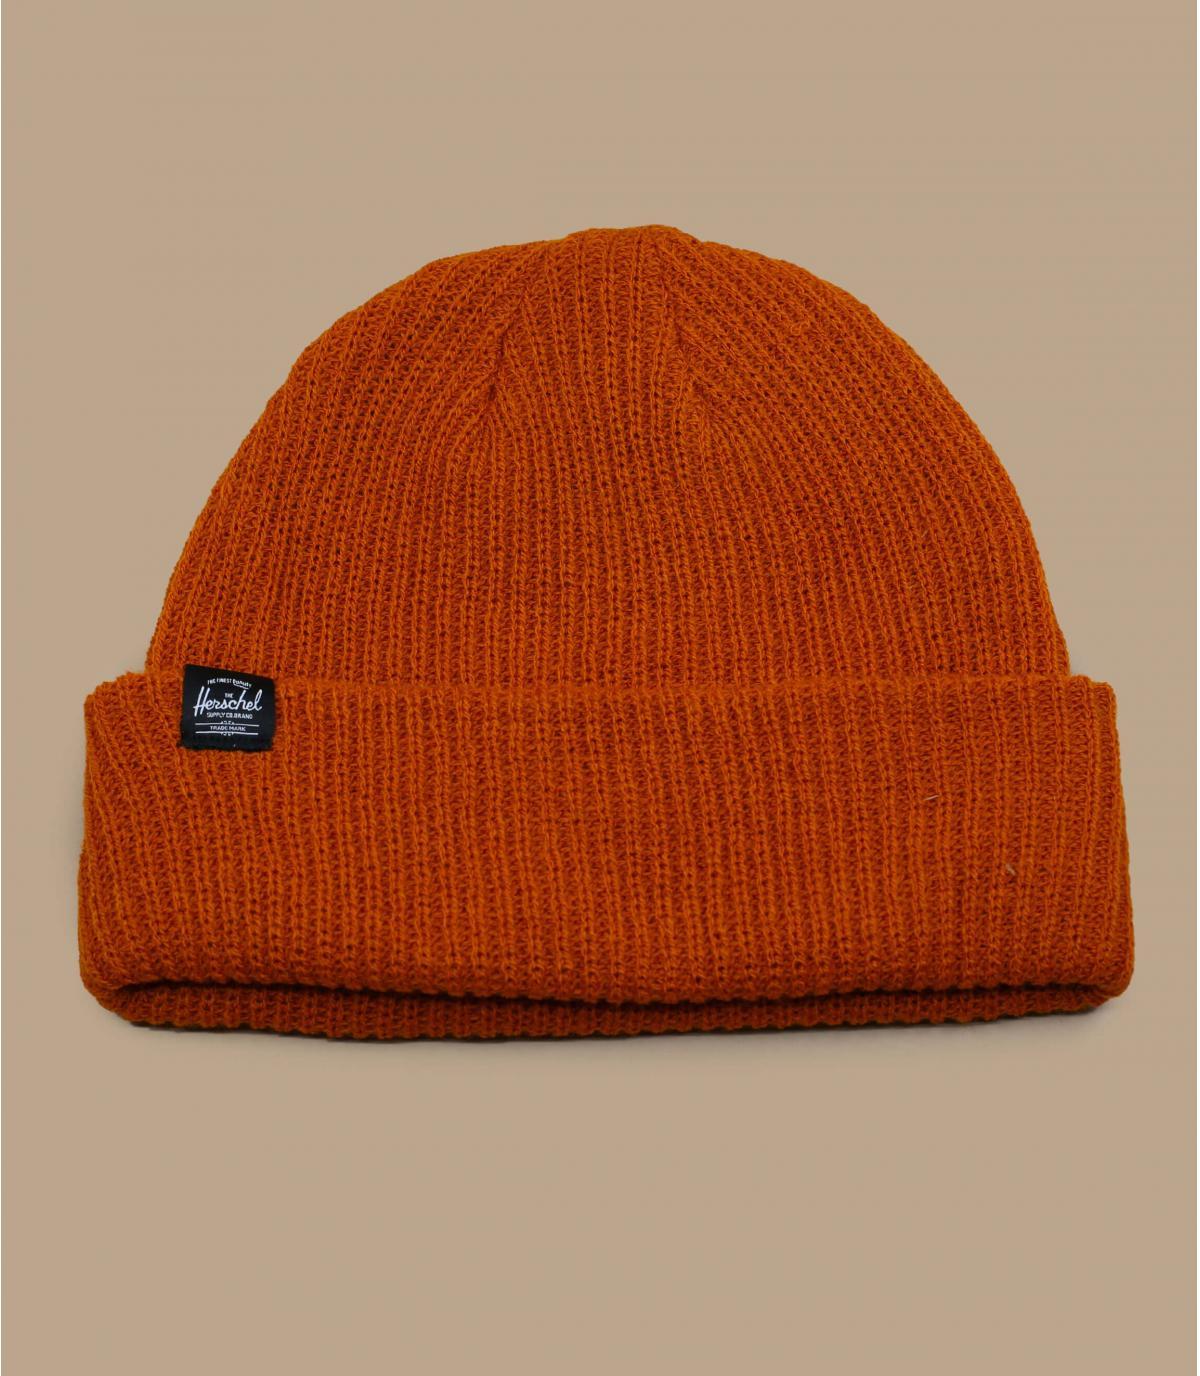 bonnet docker Herschel marron